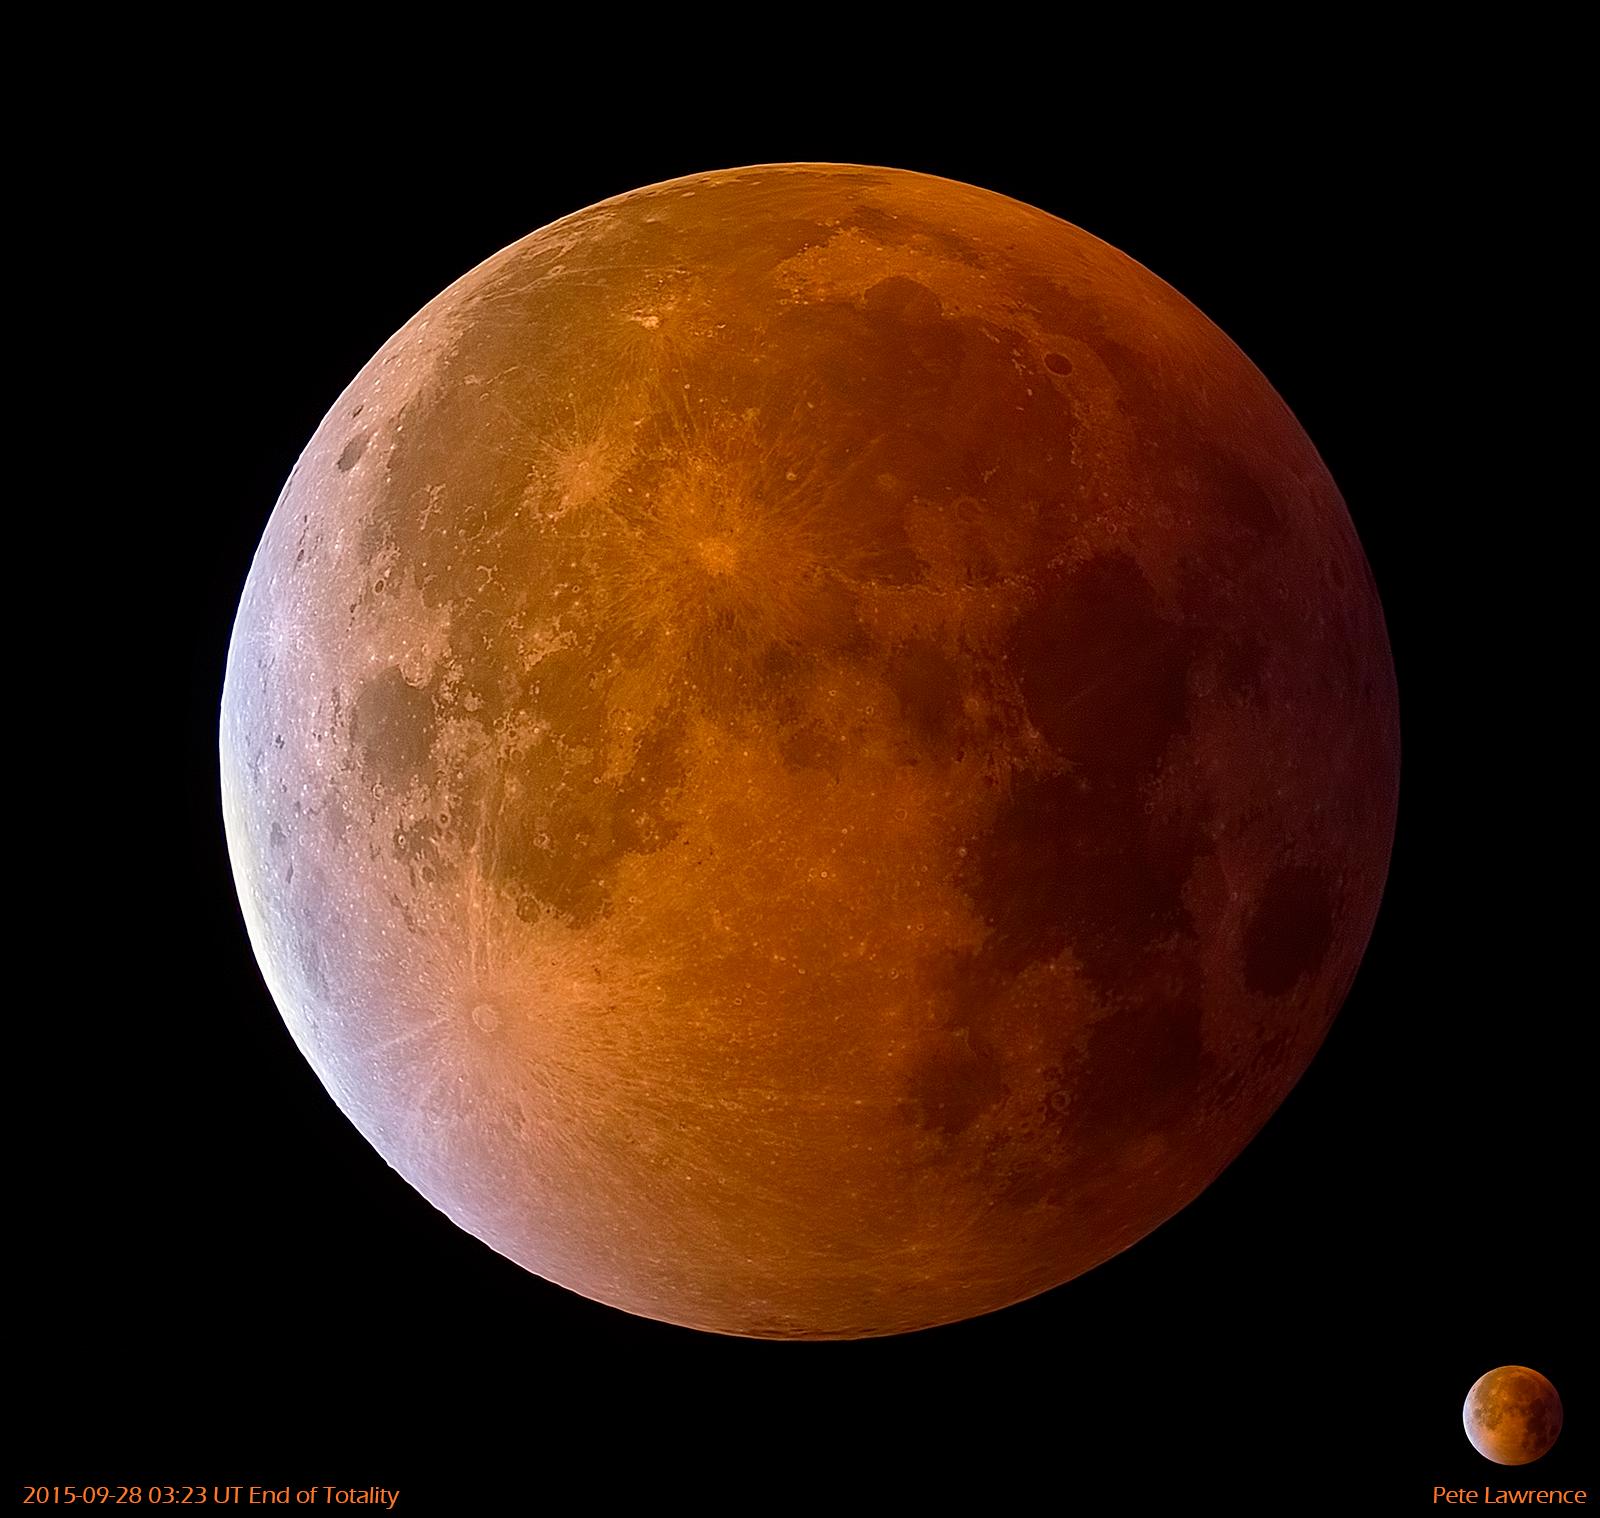 gal_eclipse_14